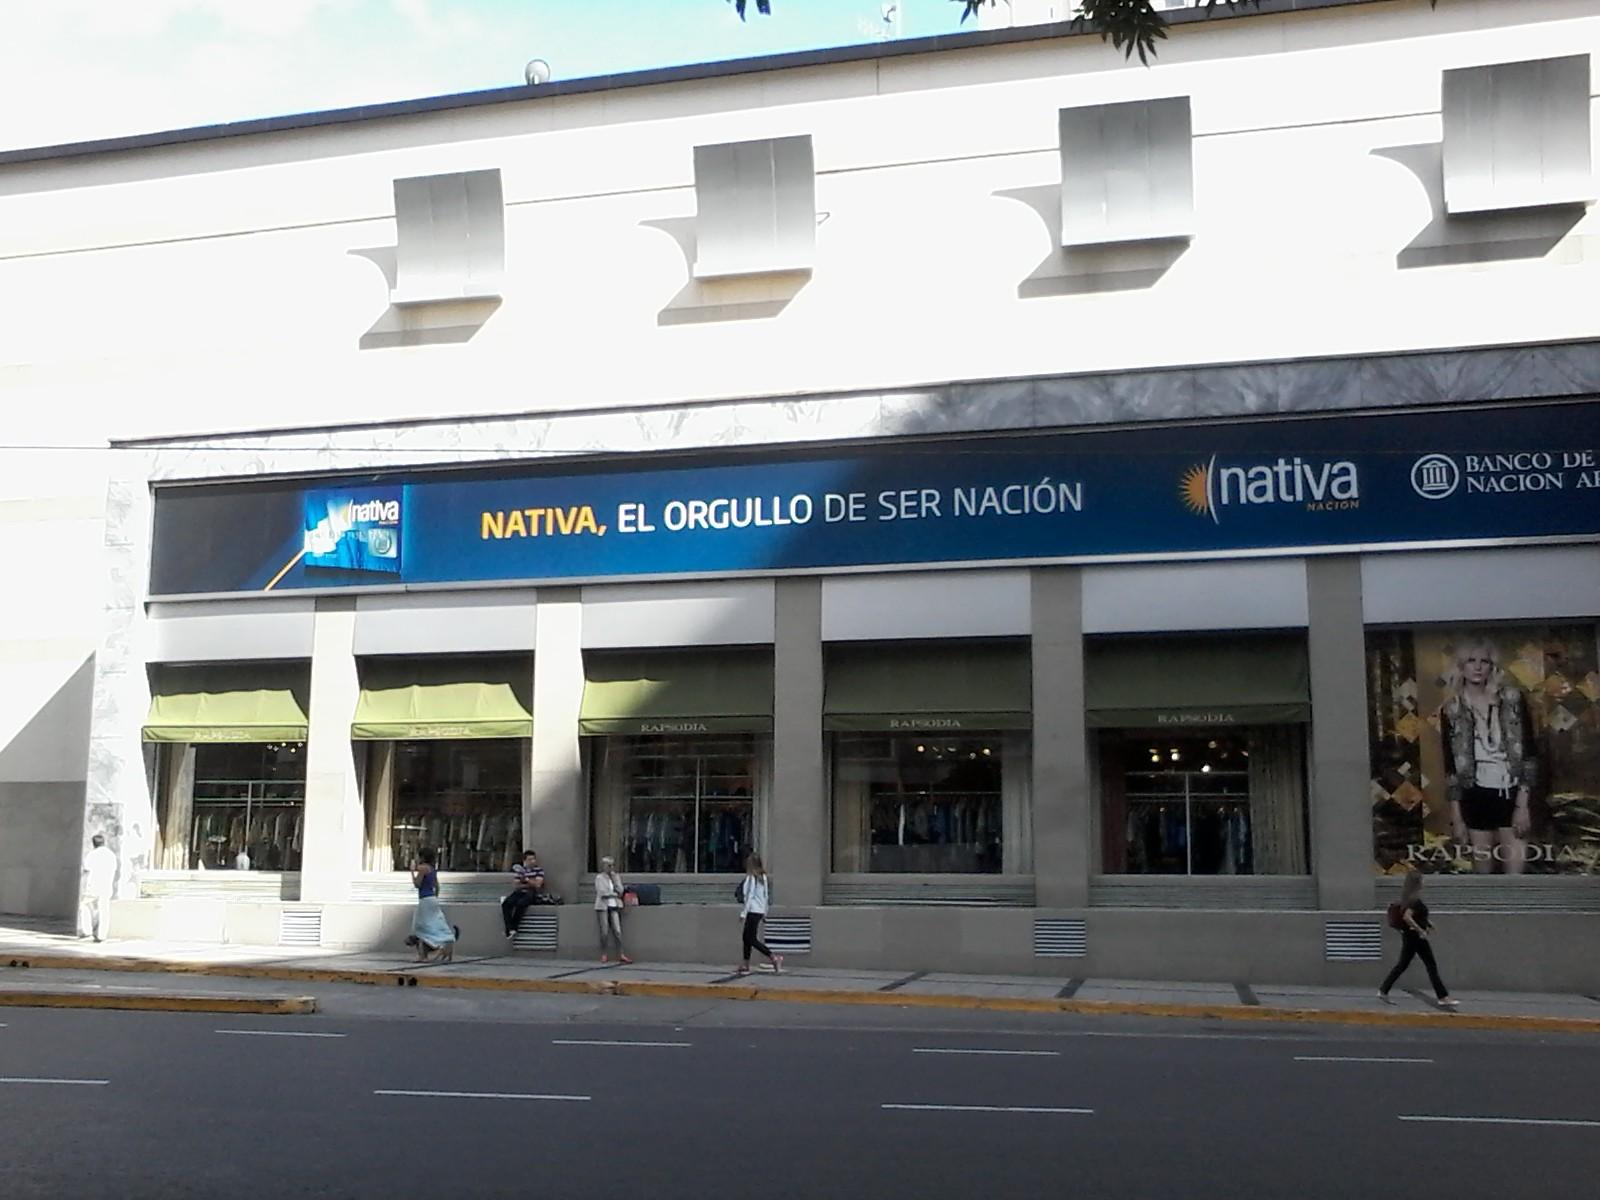 BA 149 - EL ORGULLO DE SER NACION